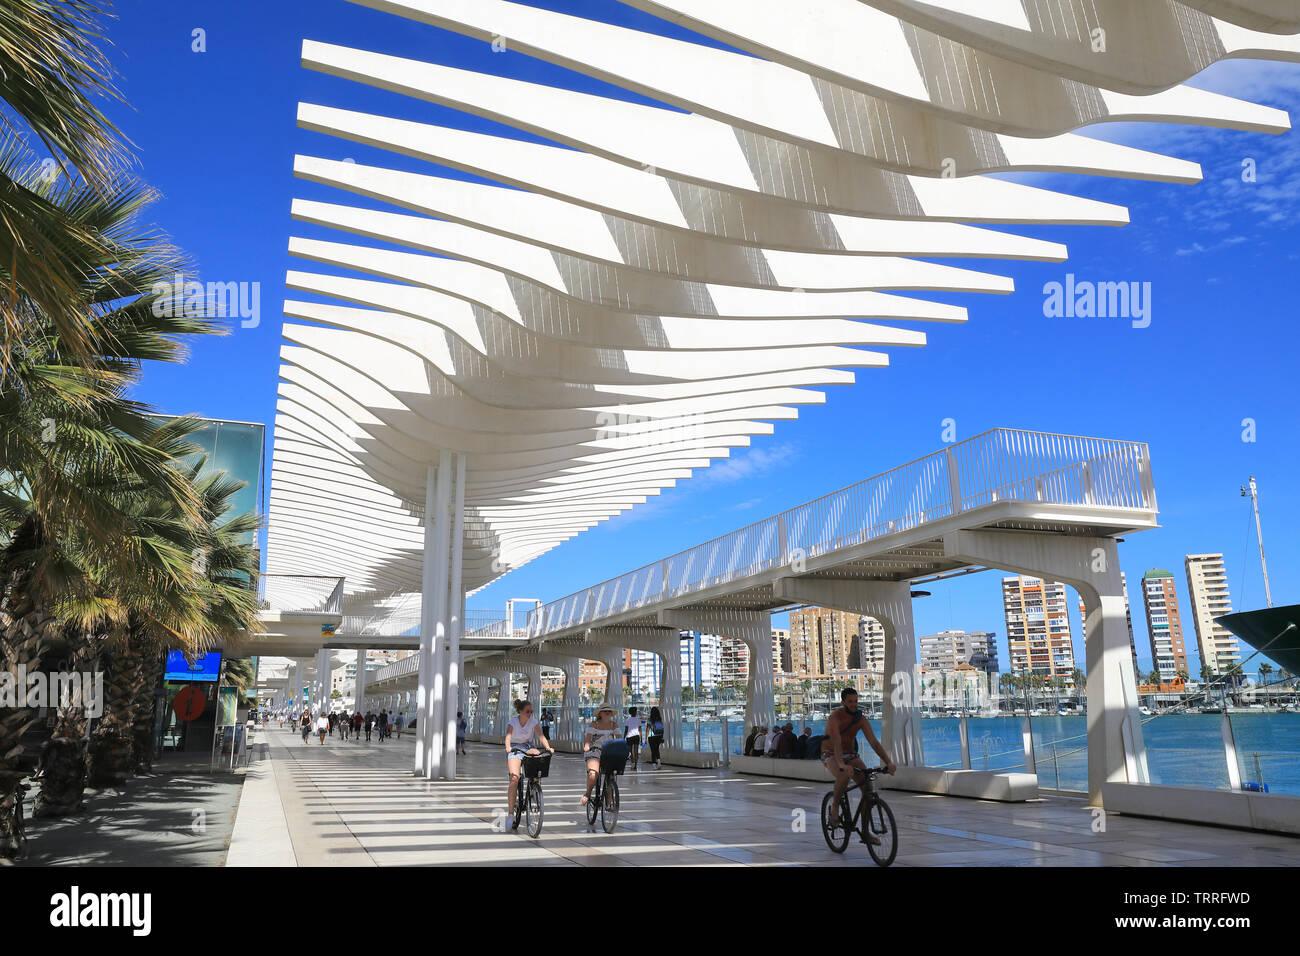 Palmeral de las Sorpresas, die moderne Hafenpromenade im ...